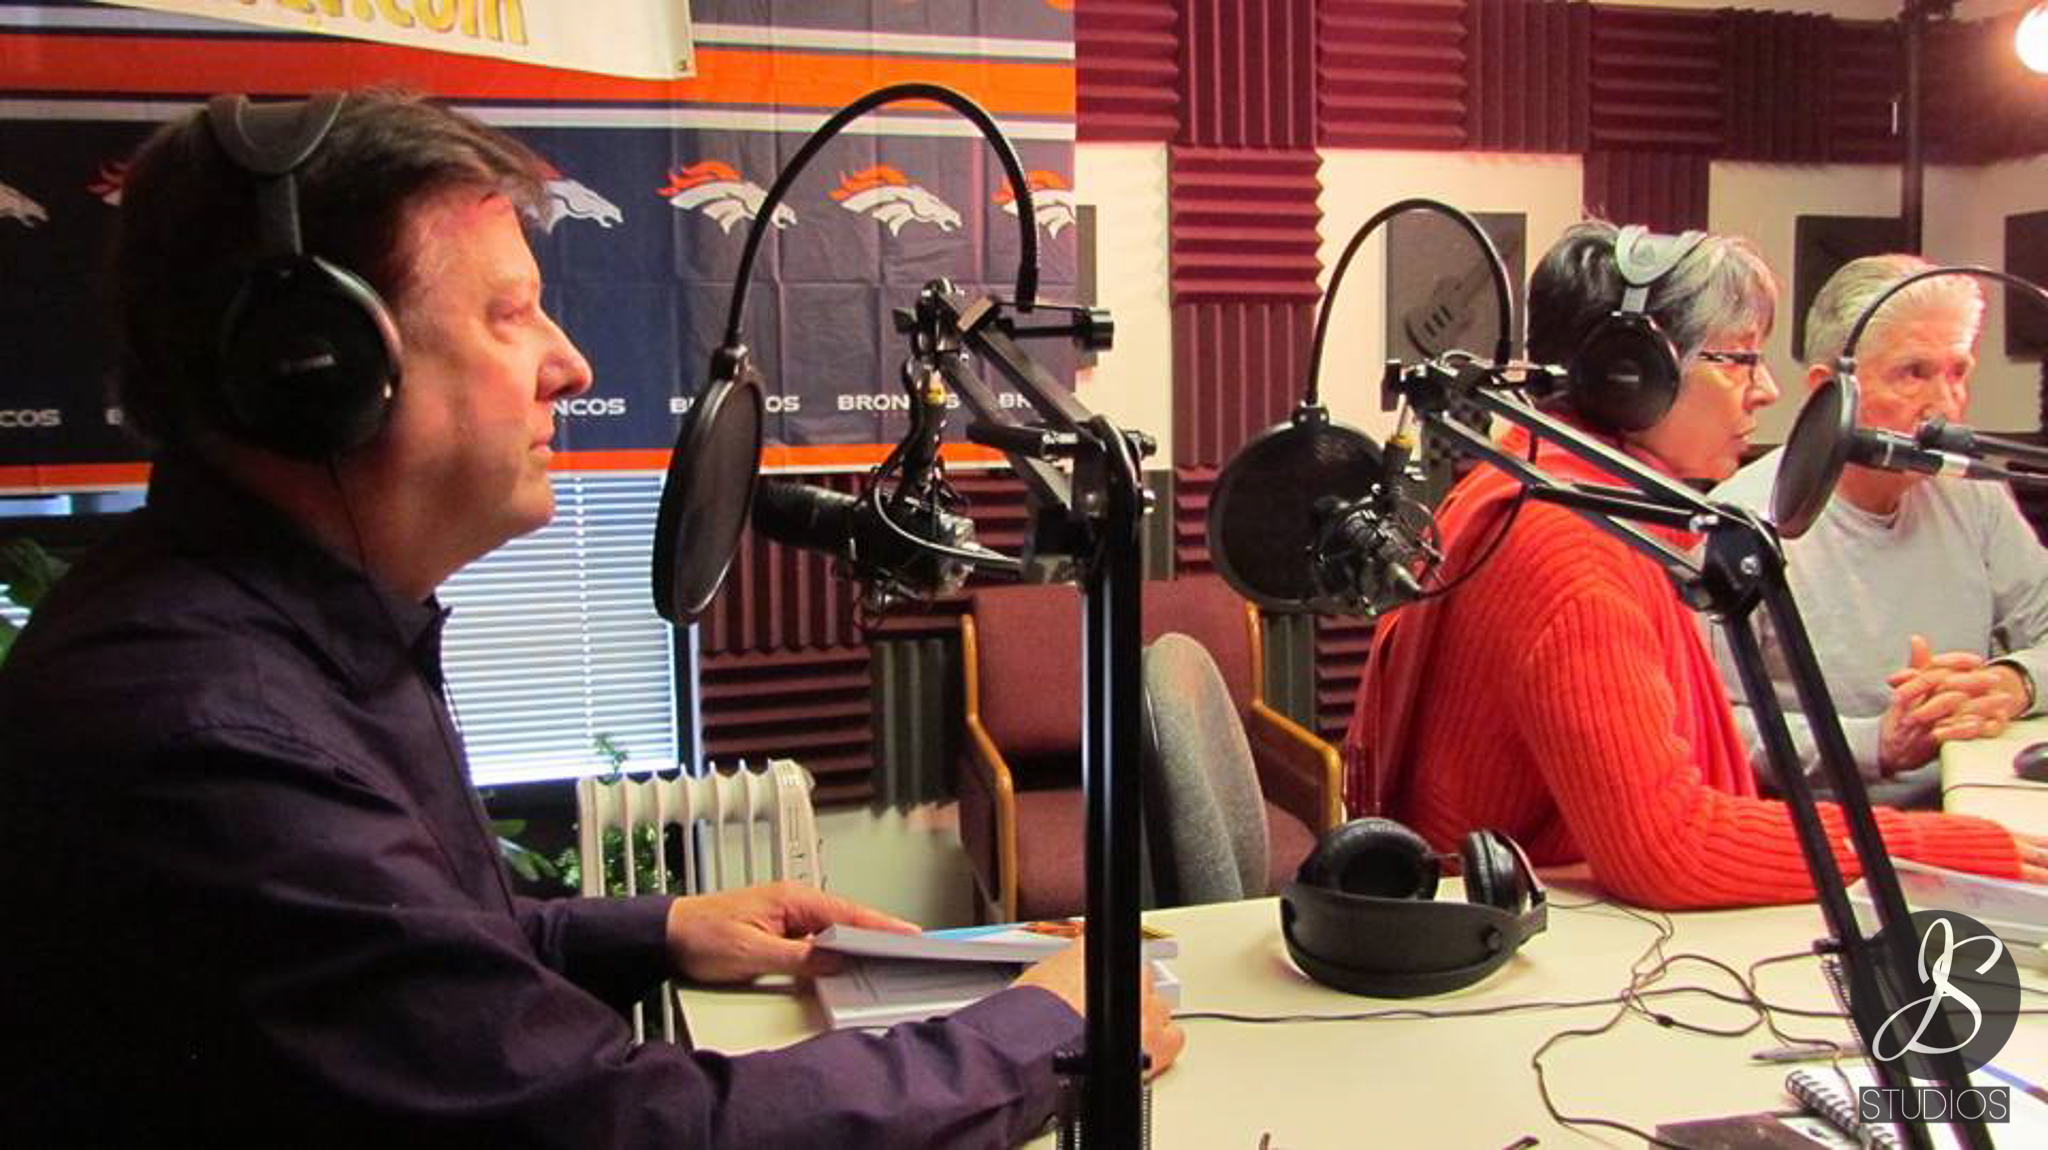 KUHS Denver The Author Show Tom Tolman-9.jpg